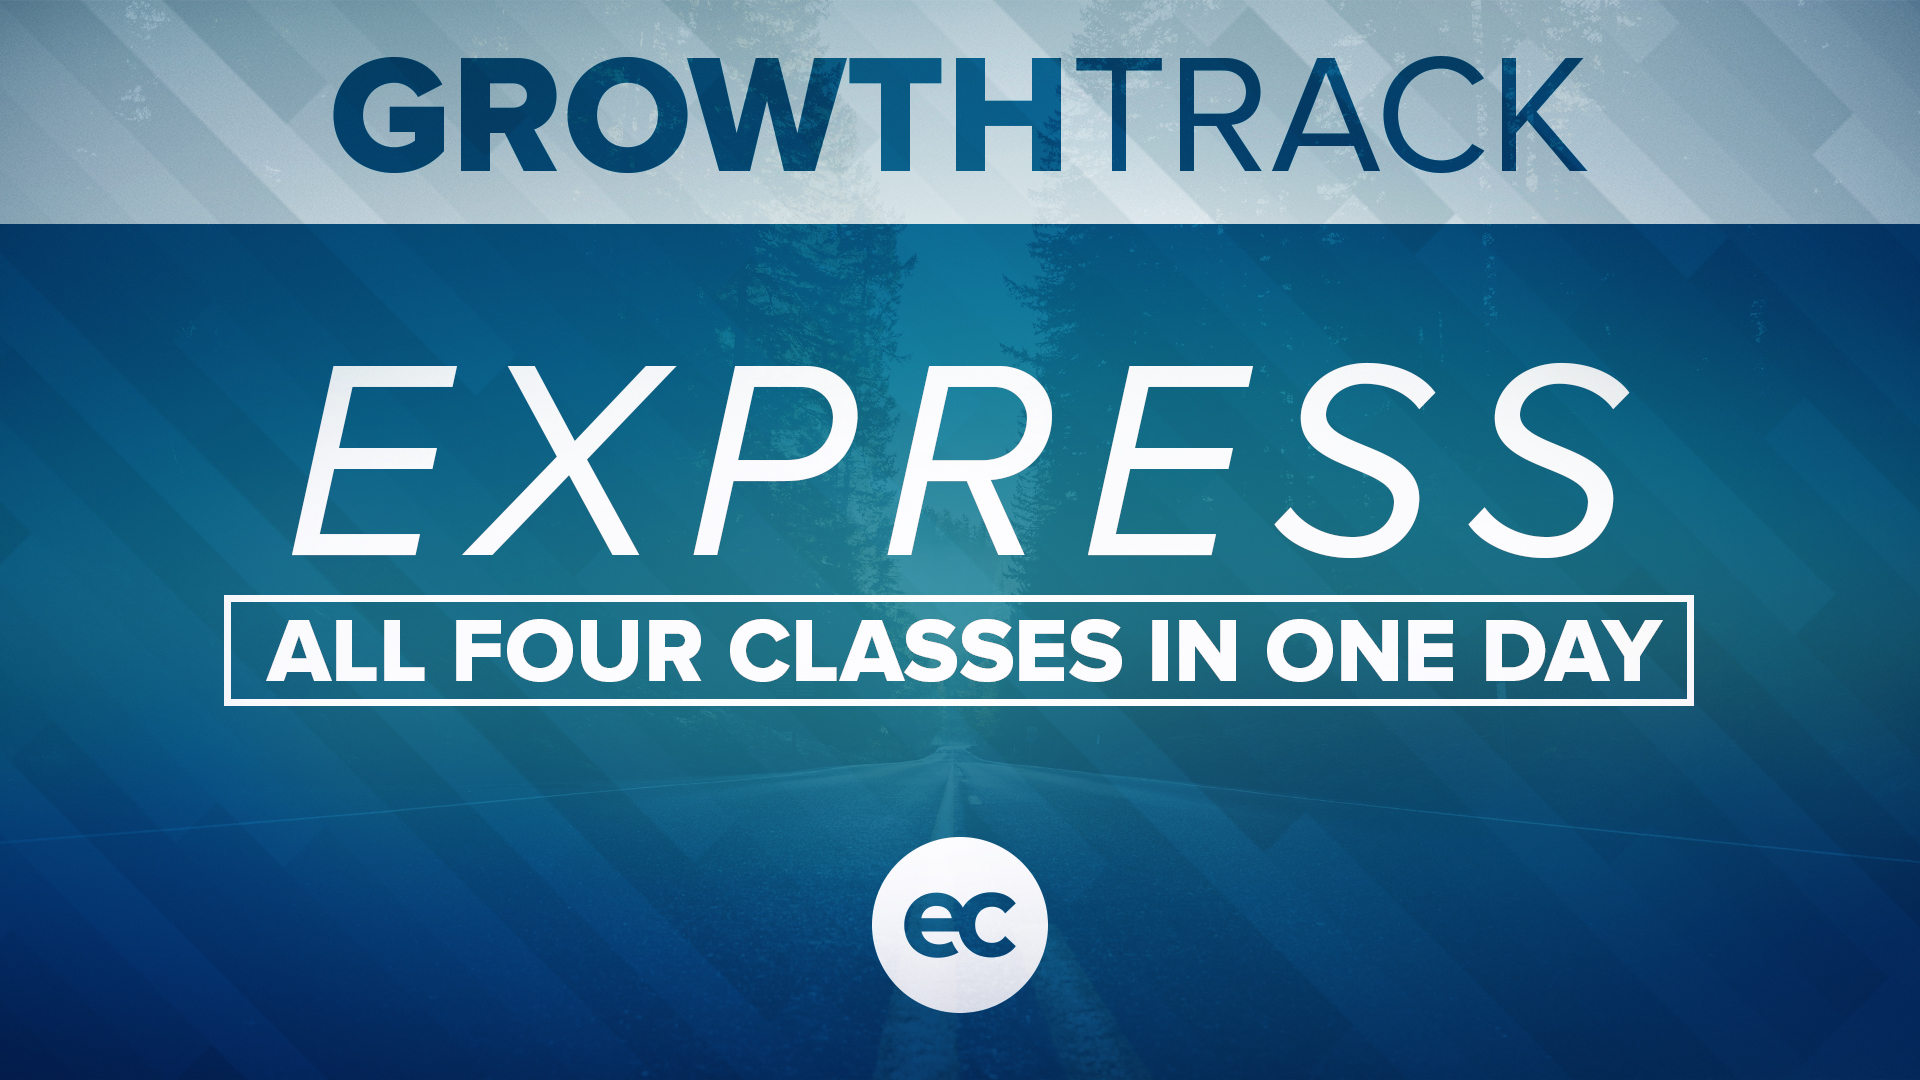 Growth Track Express.jpg